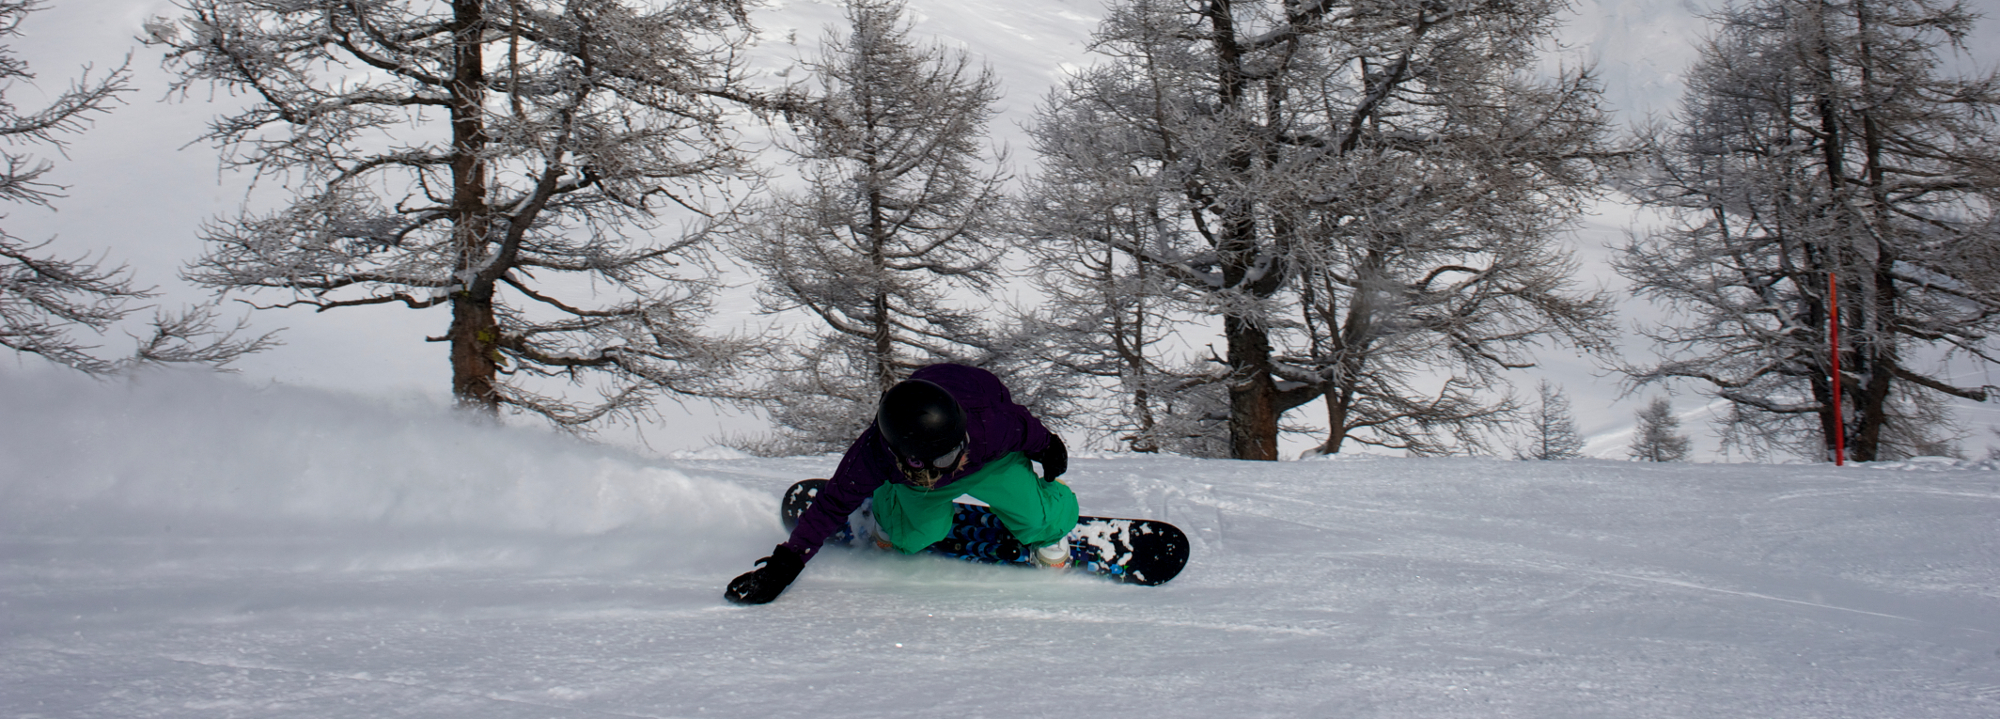 Slide-snowboard_web